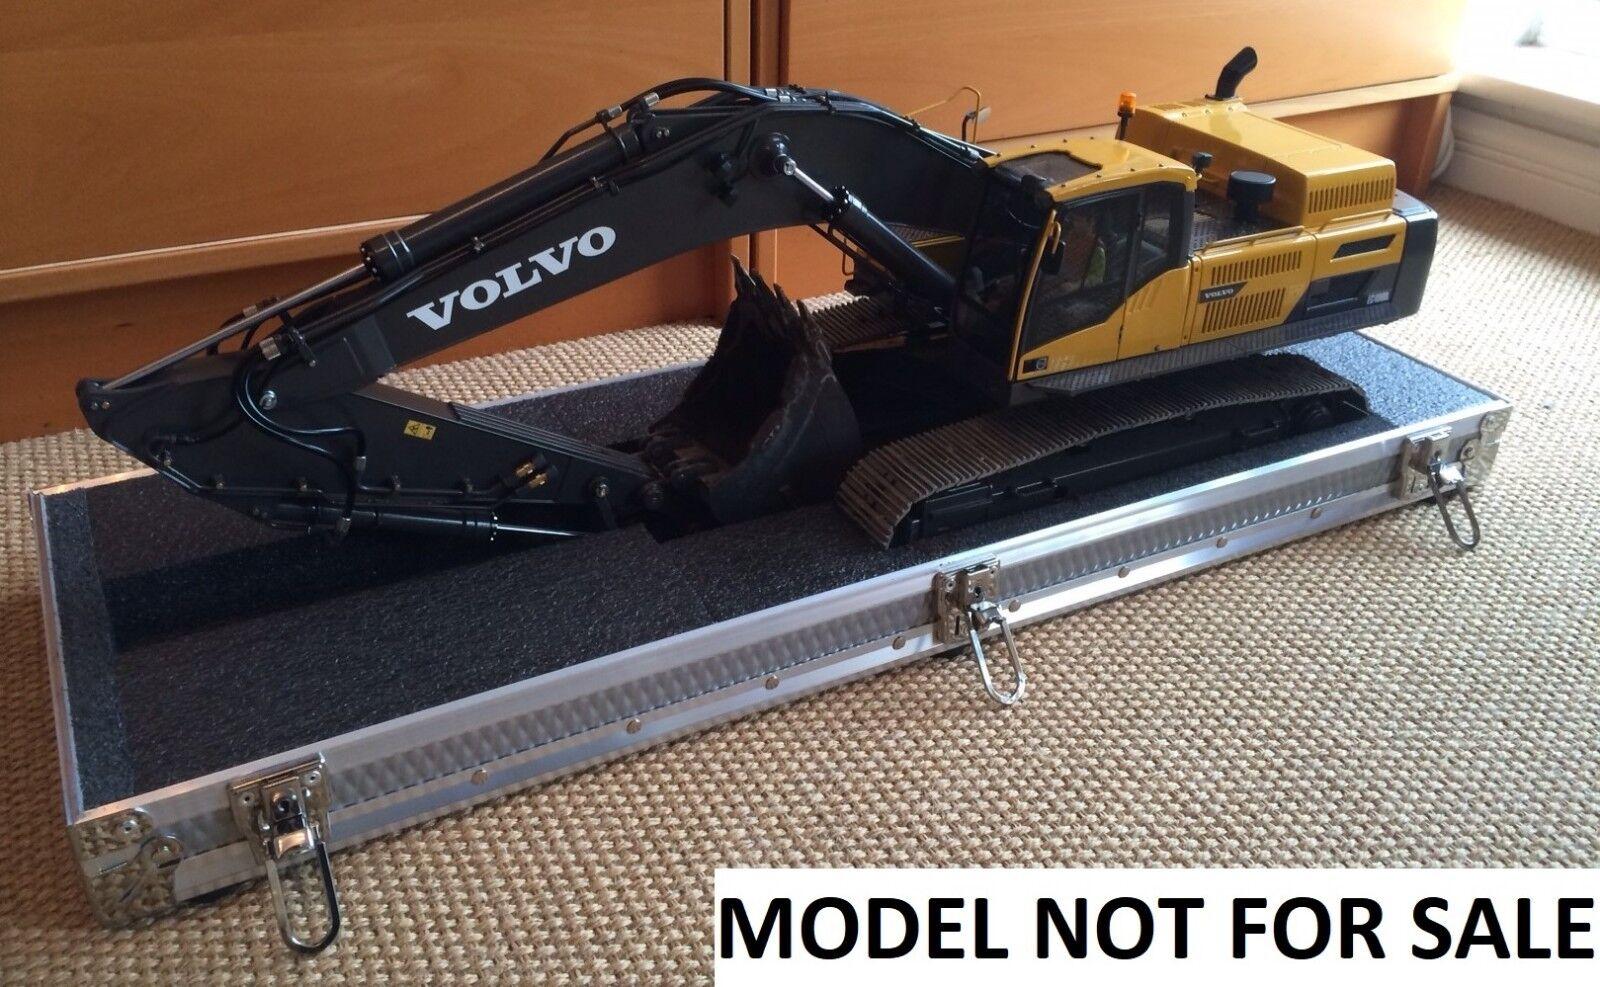 Premacom, Wedico, Damitz, RC4WD, Suitcase for RC hydraulic excavator